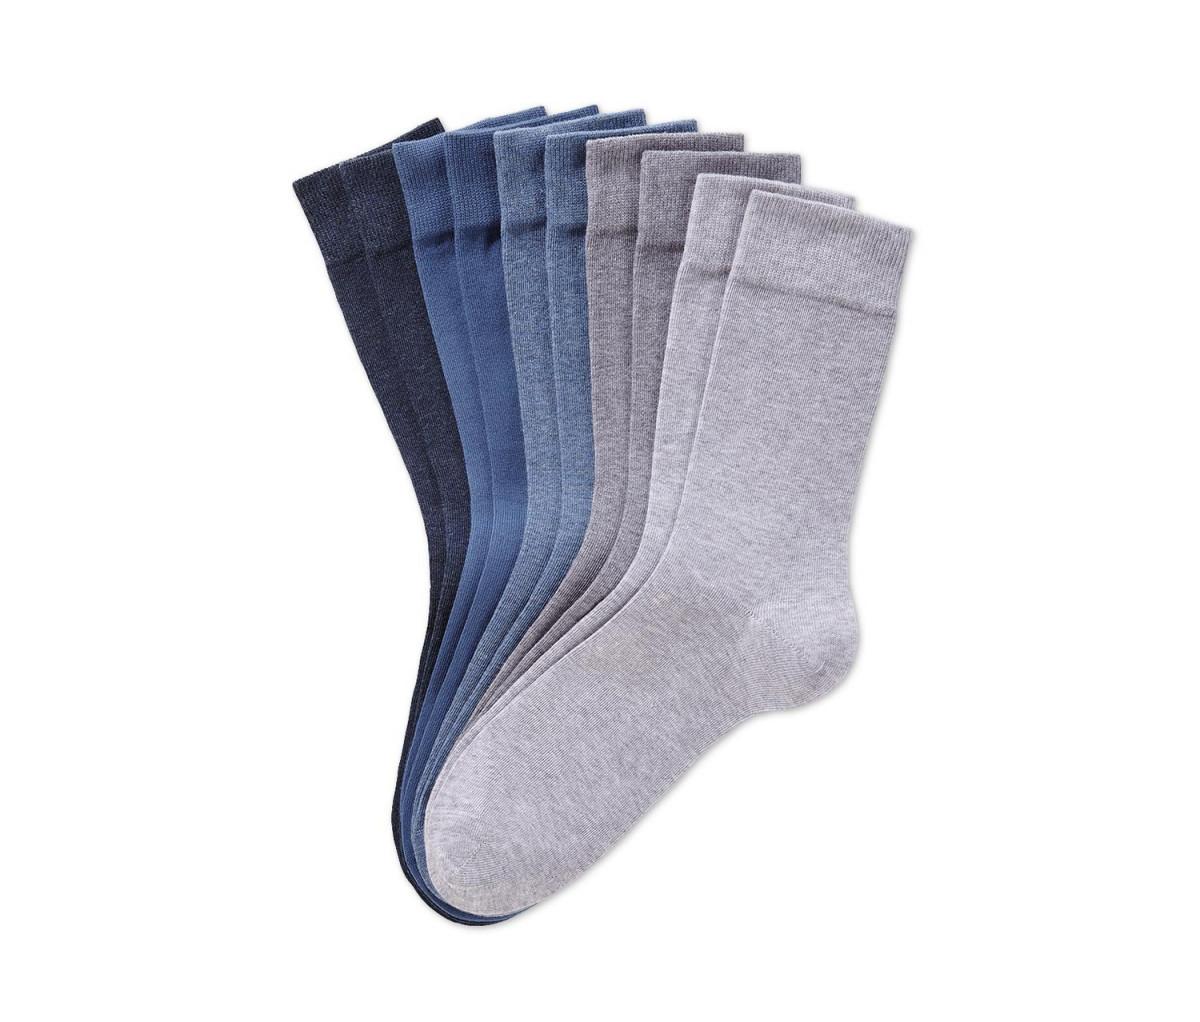 Mens Socks Set of 5  Grey/Blue